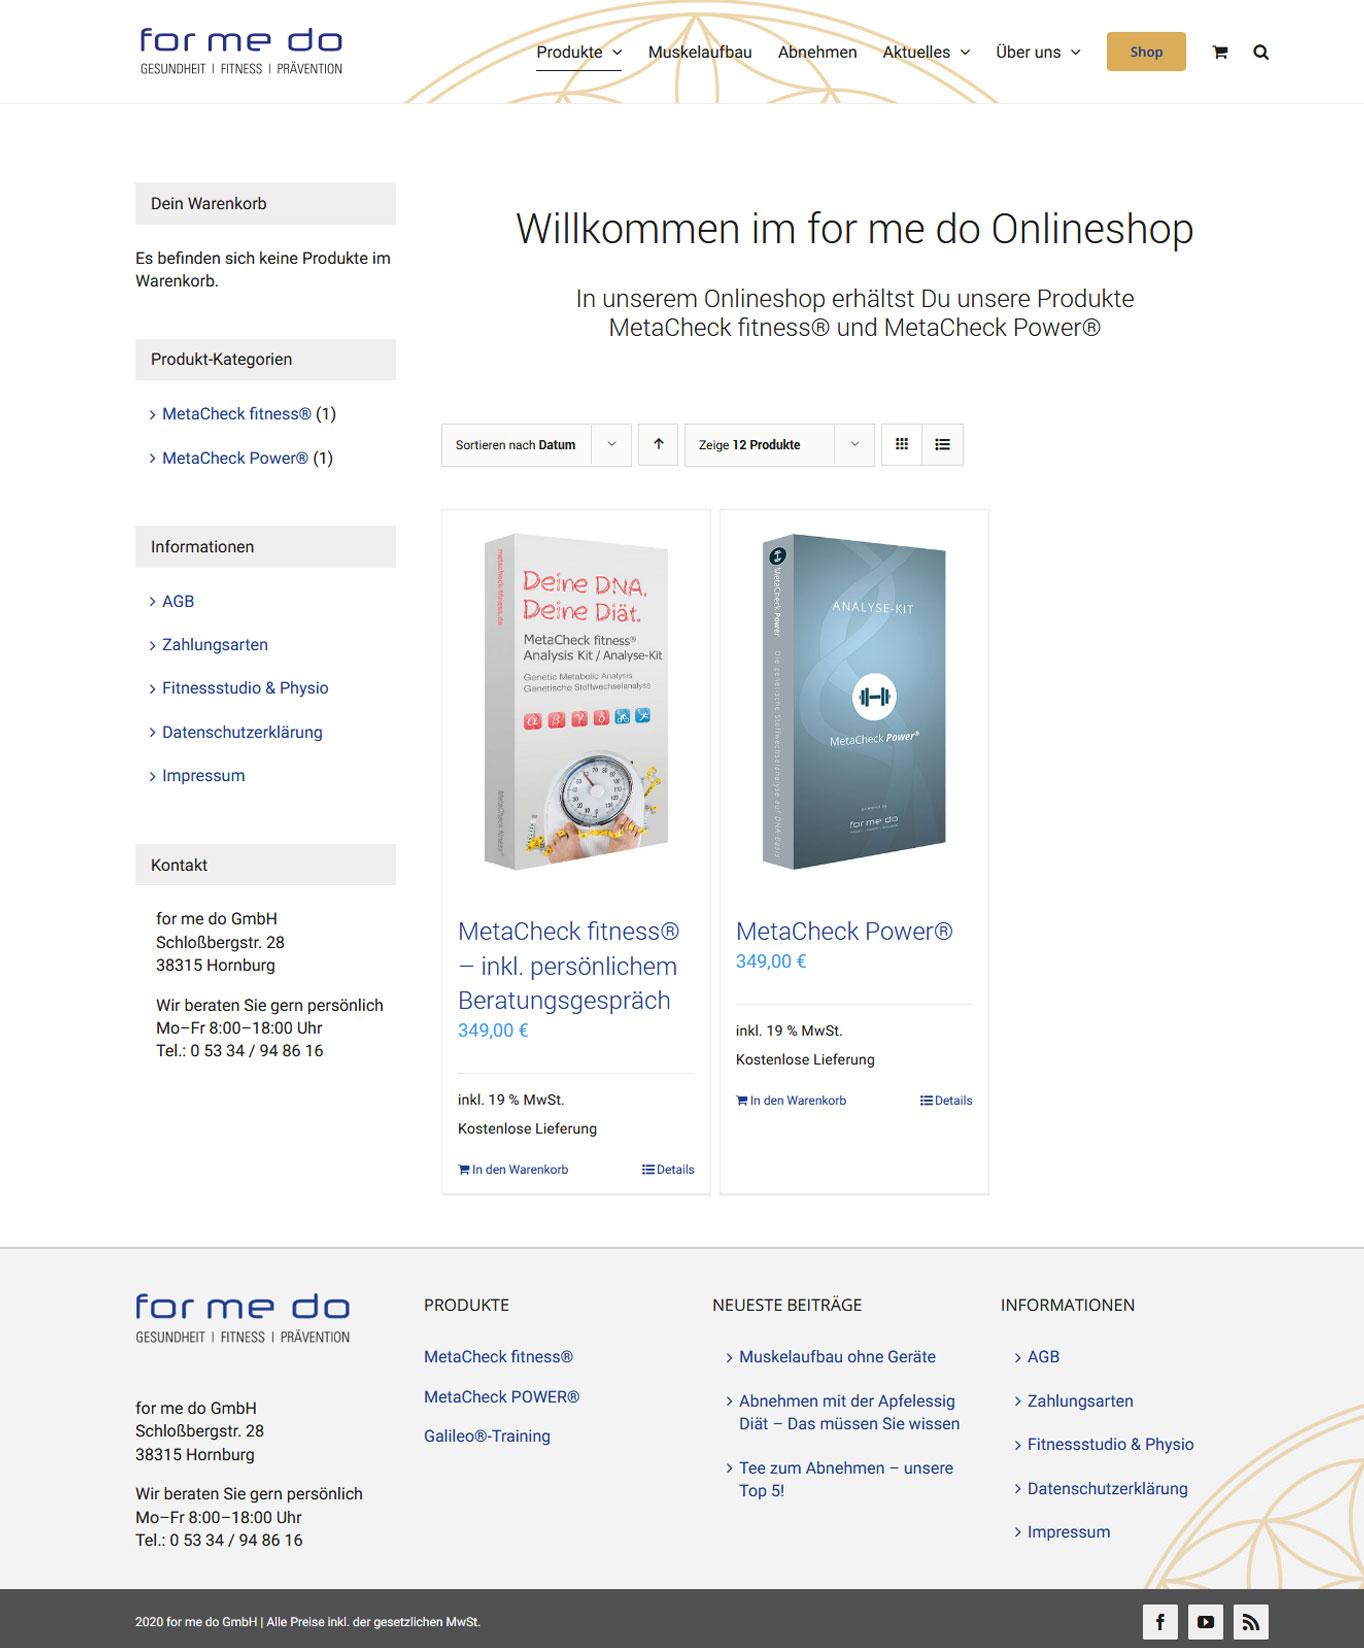 formedo onlineshop Webdesign formedo JF Mediendesign